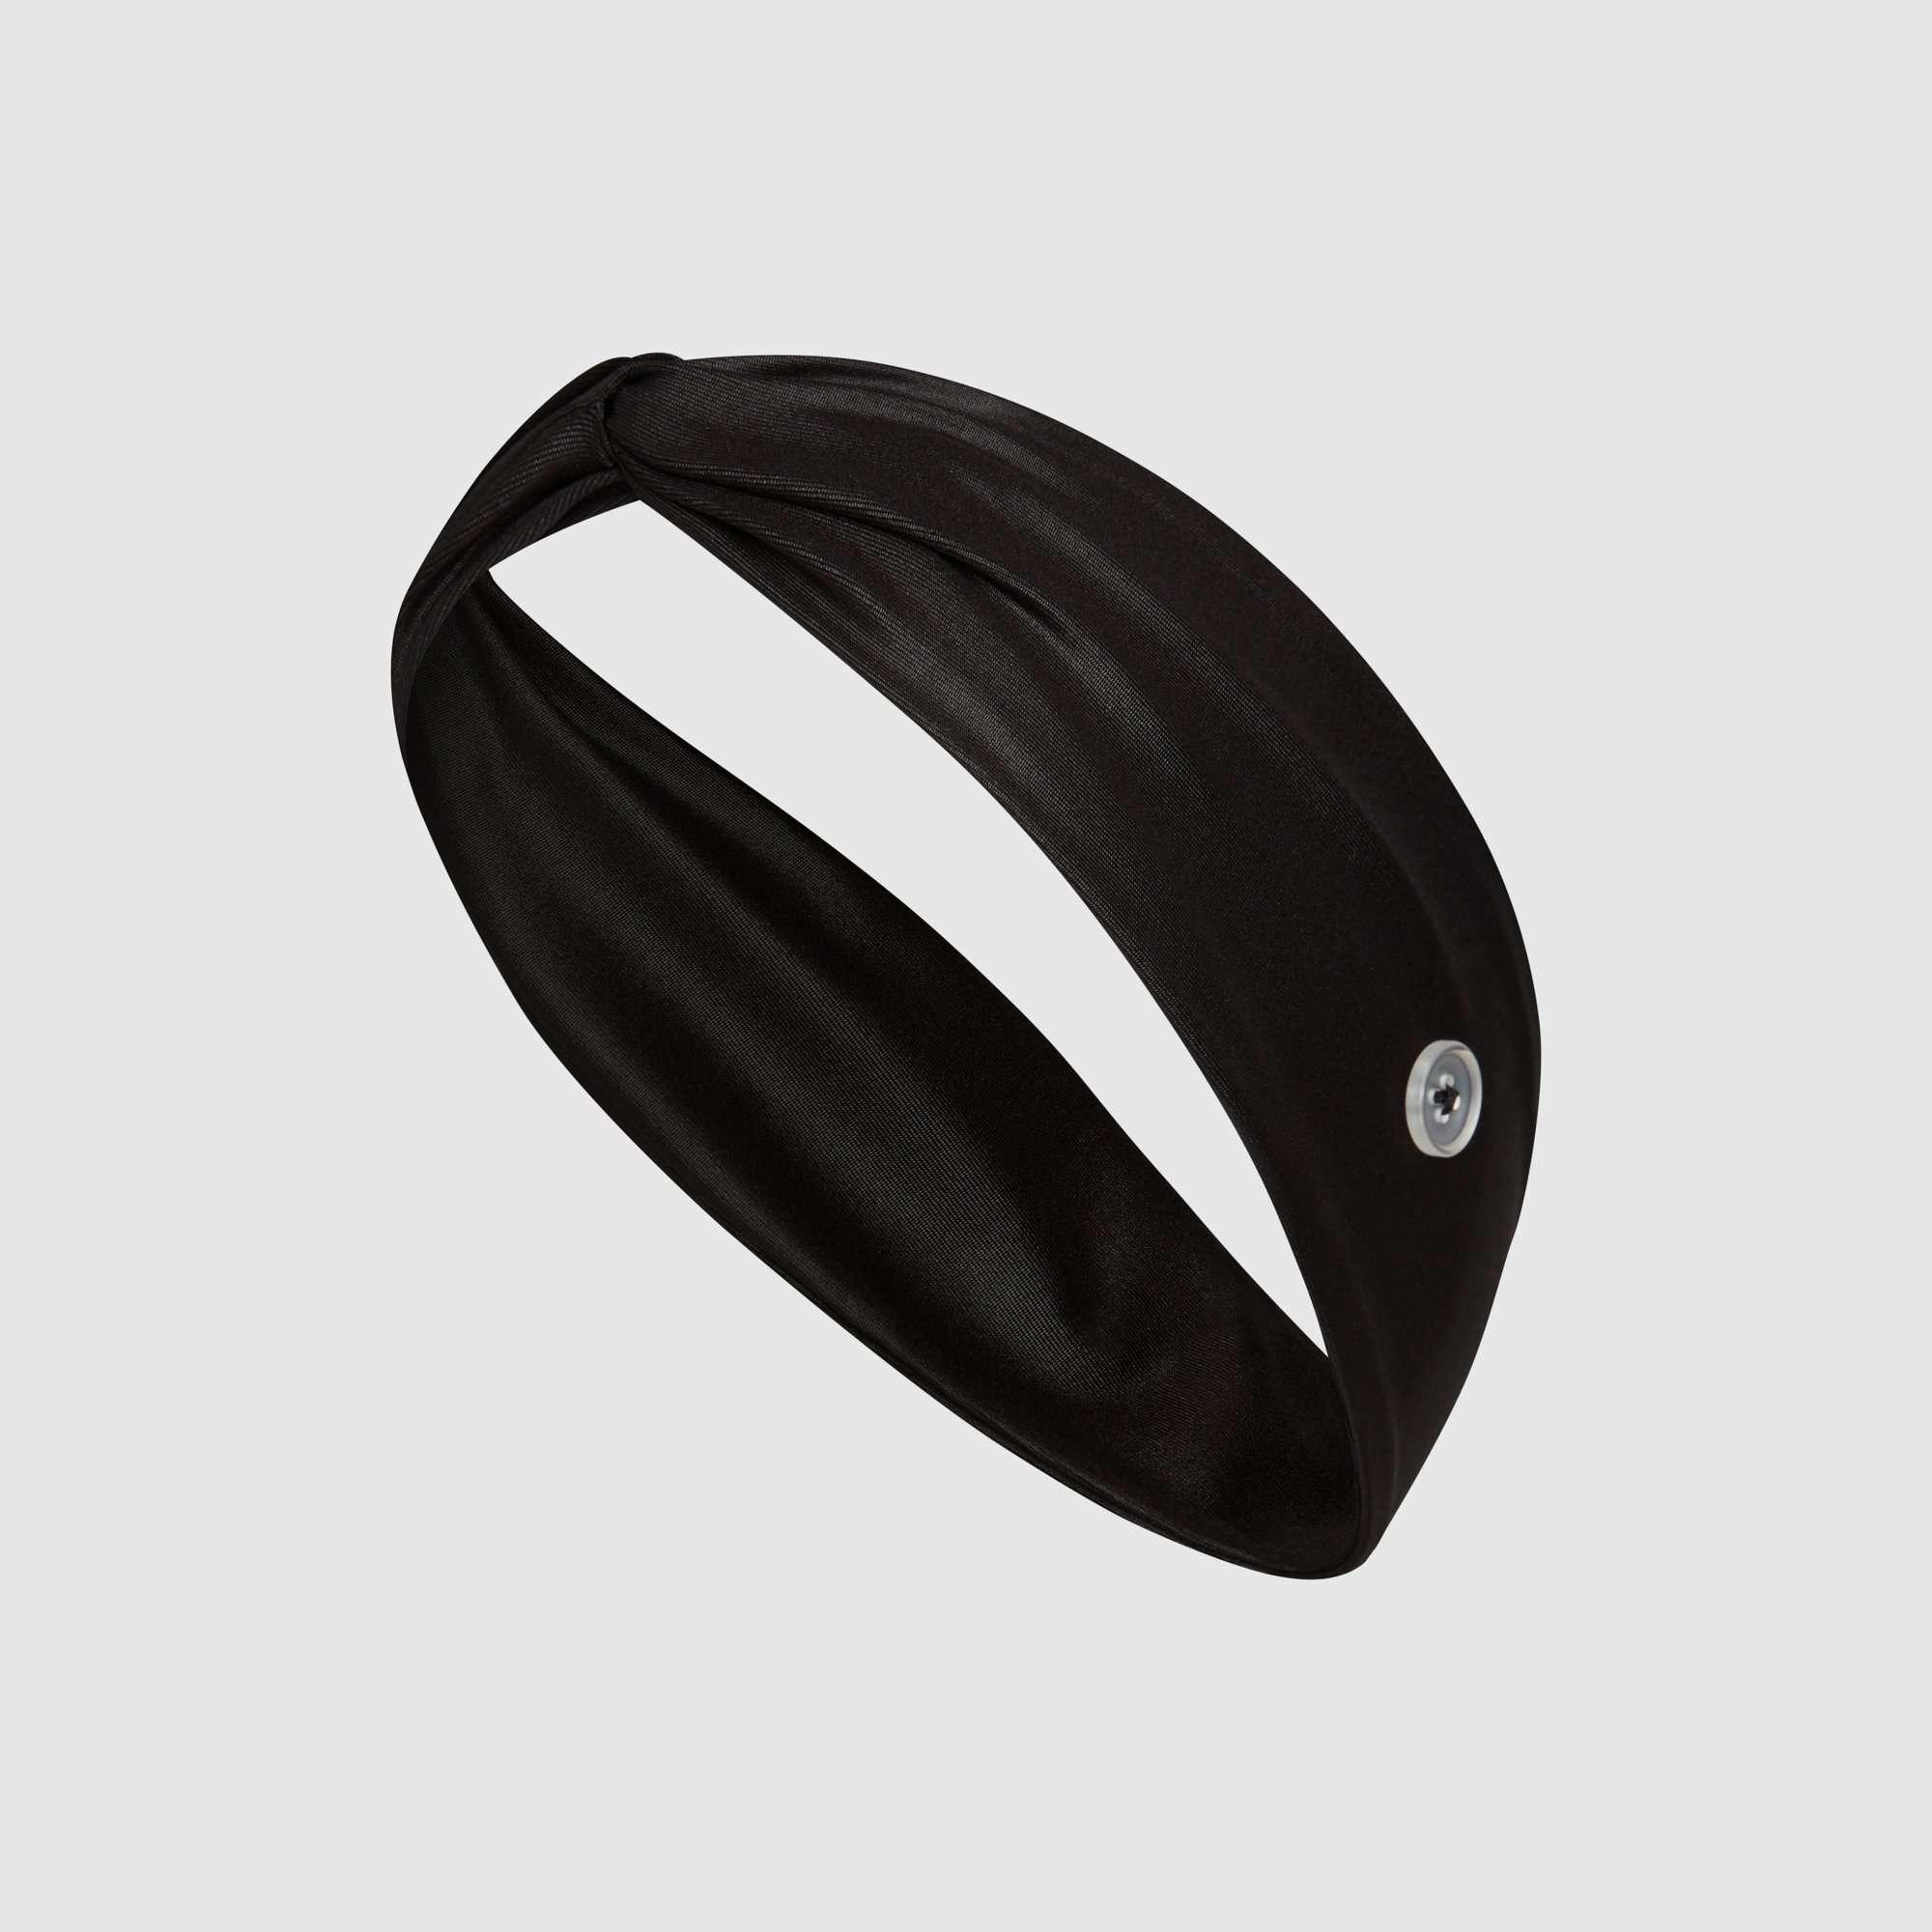 Lunair's Twist Comfort Headband